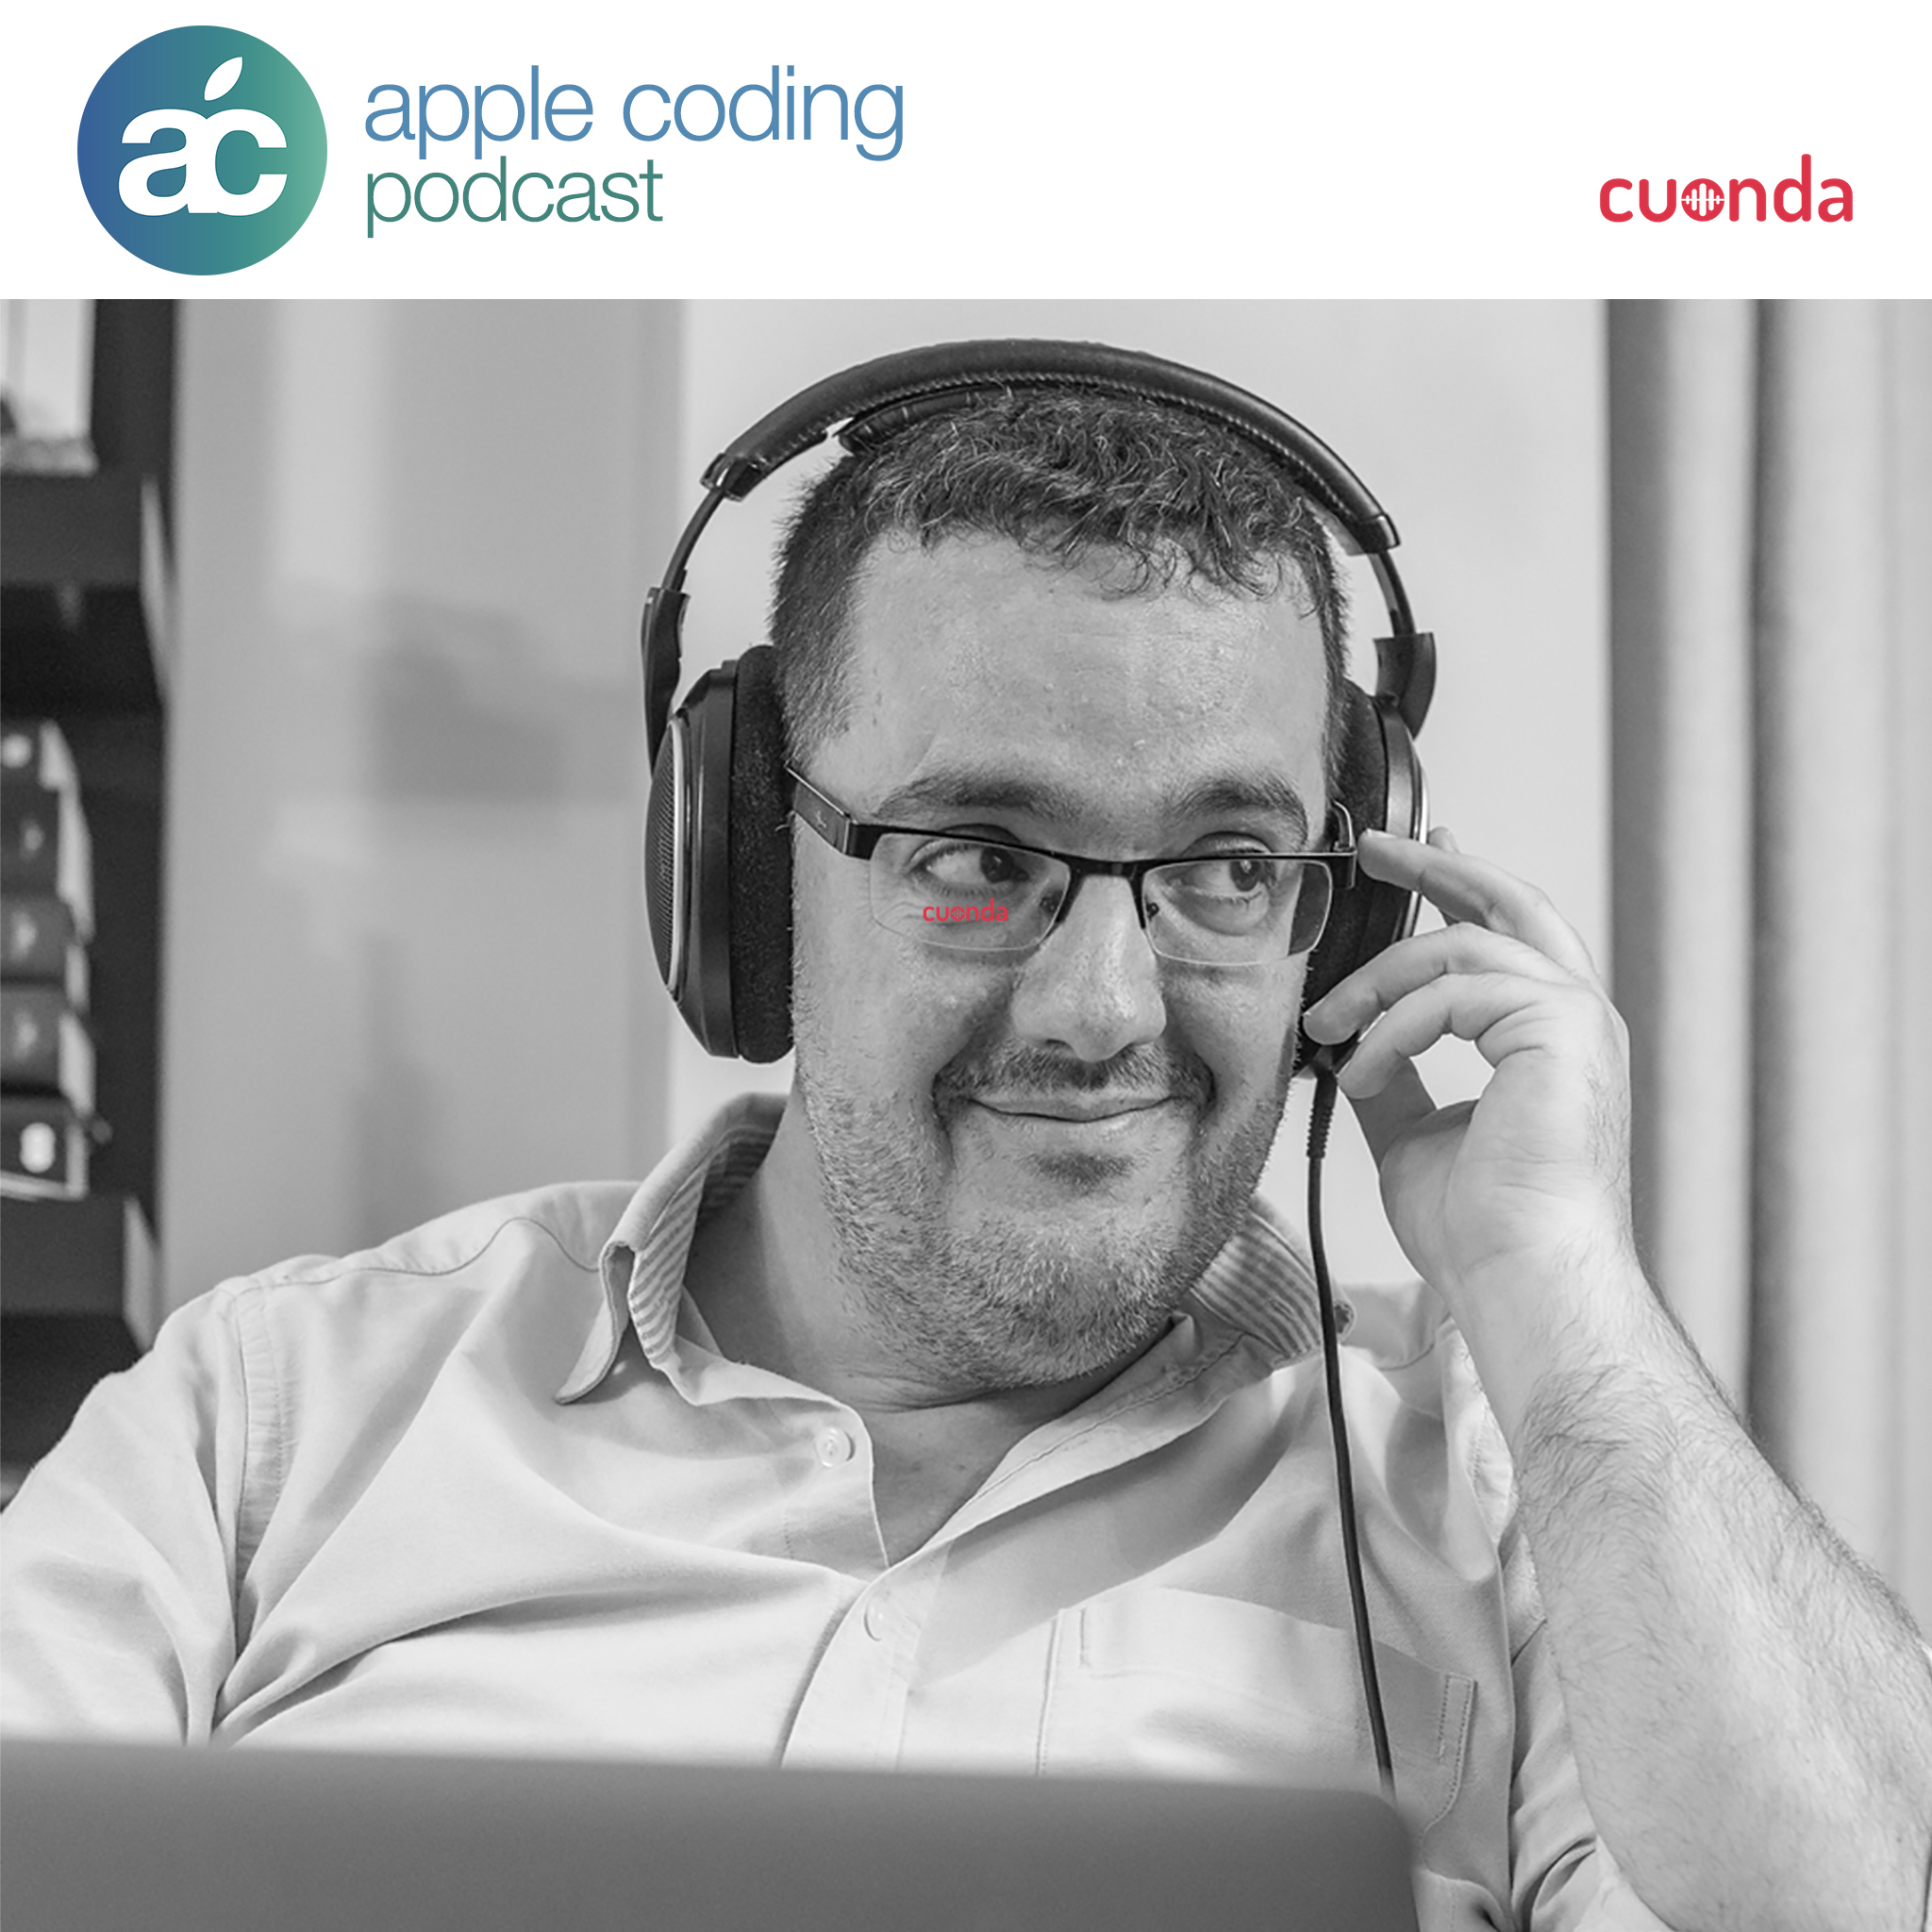 Apple Coding by Julio César Fernández Muñoz / Cuonda on Apple Podcasts